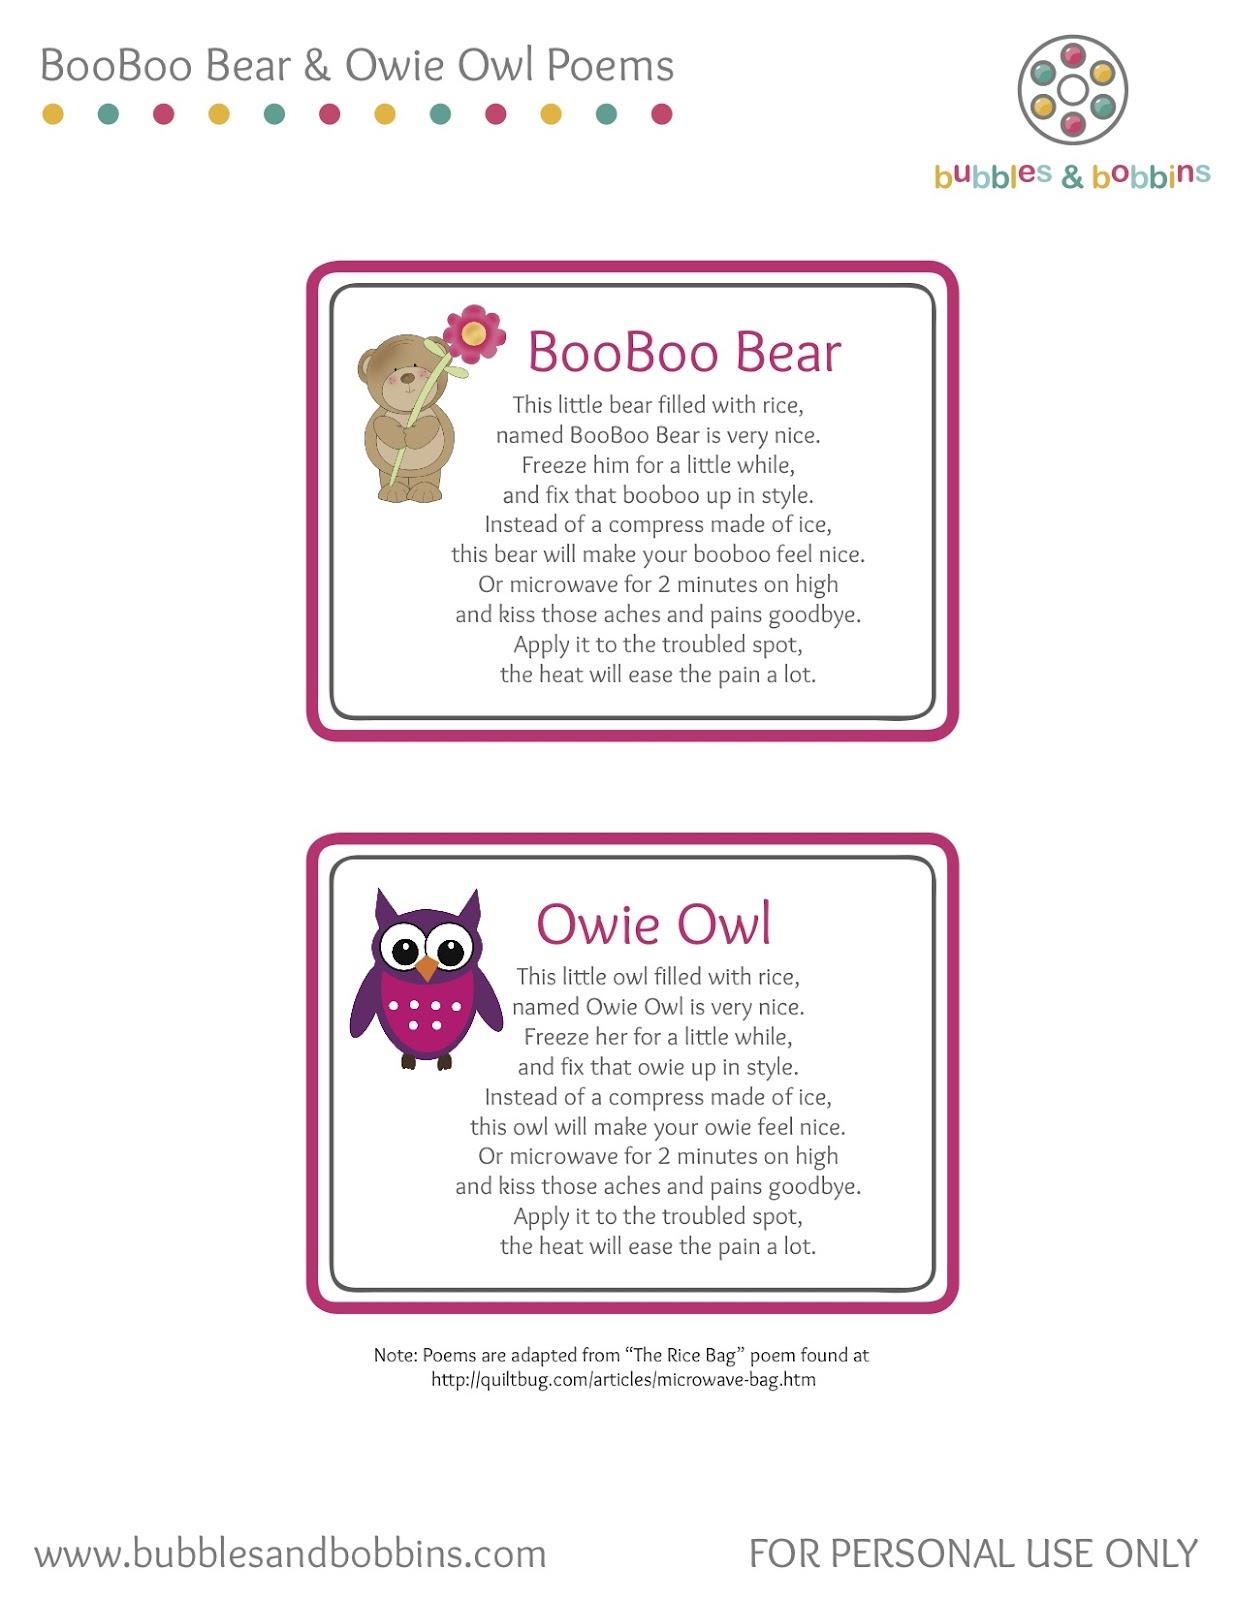 {Booboo Bear & Owie Owl Poems}